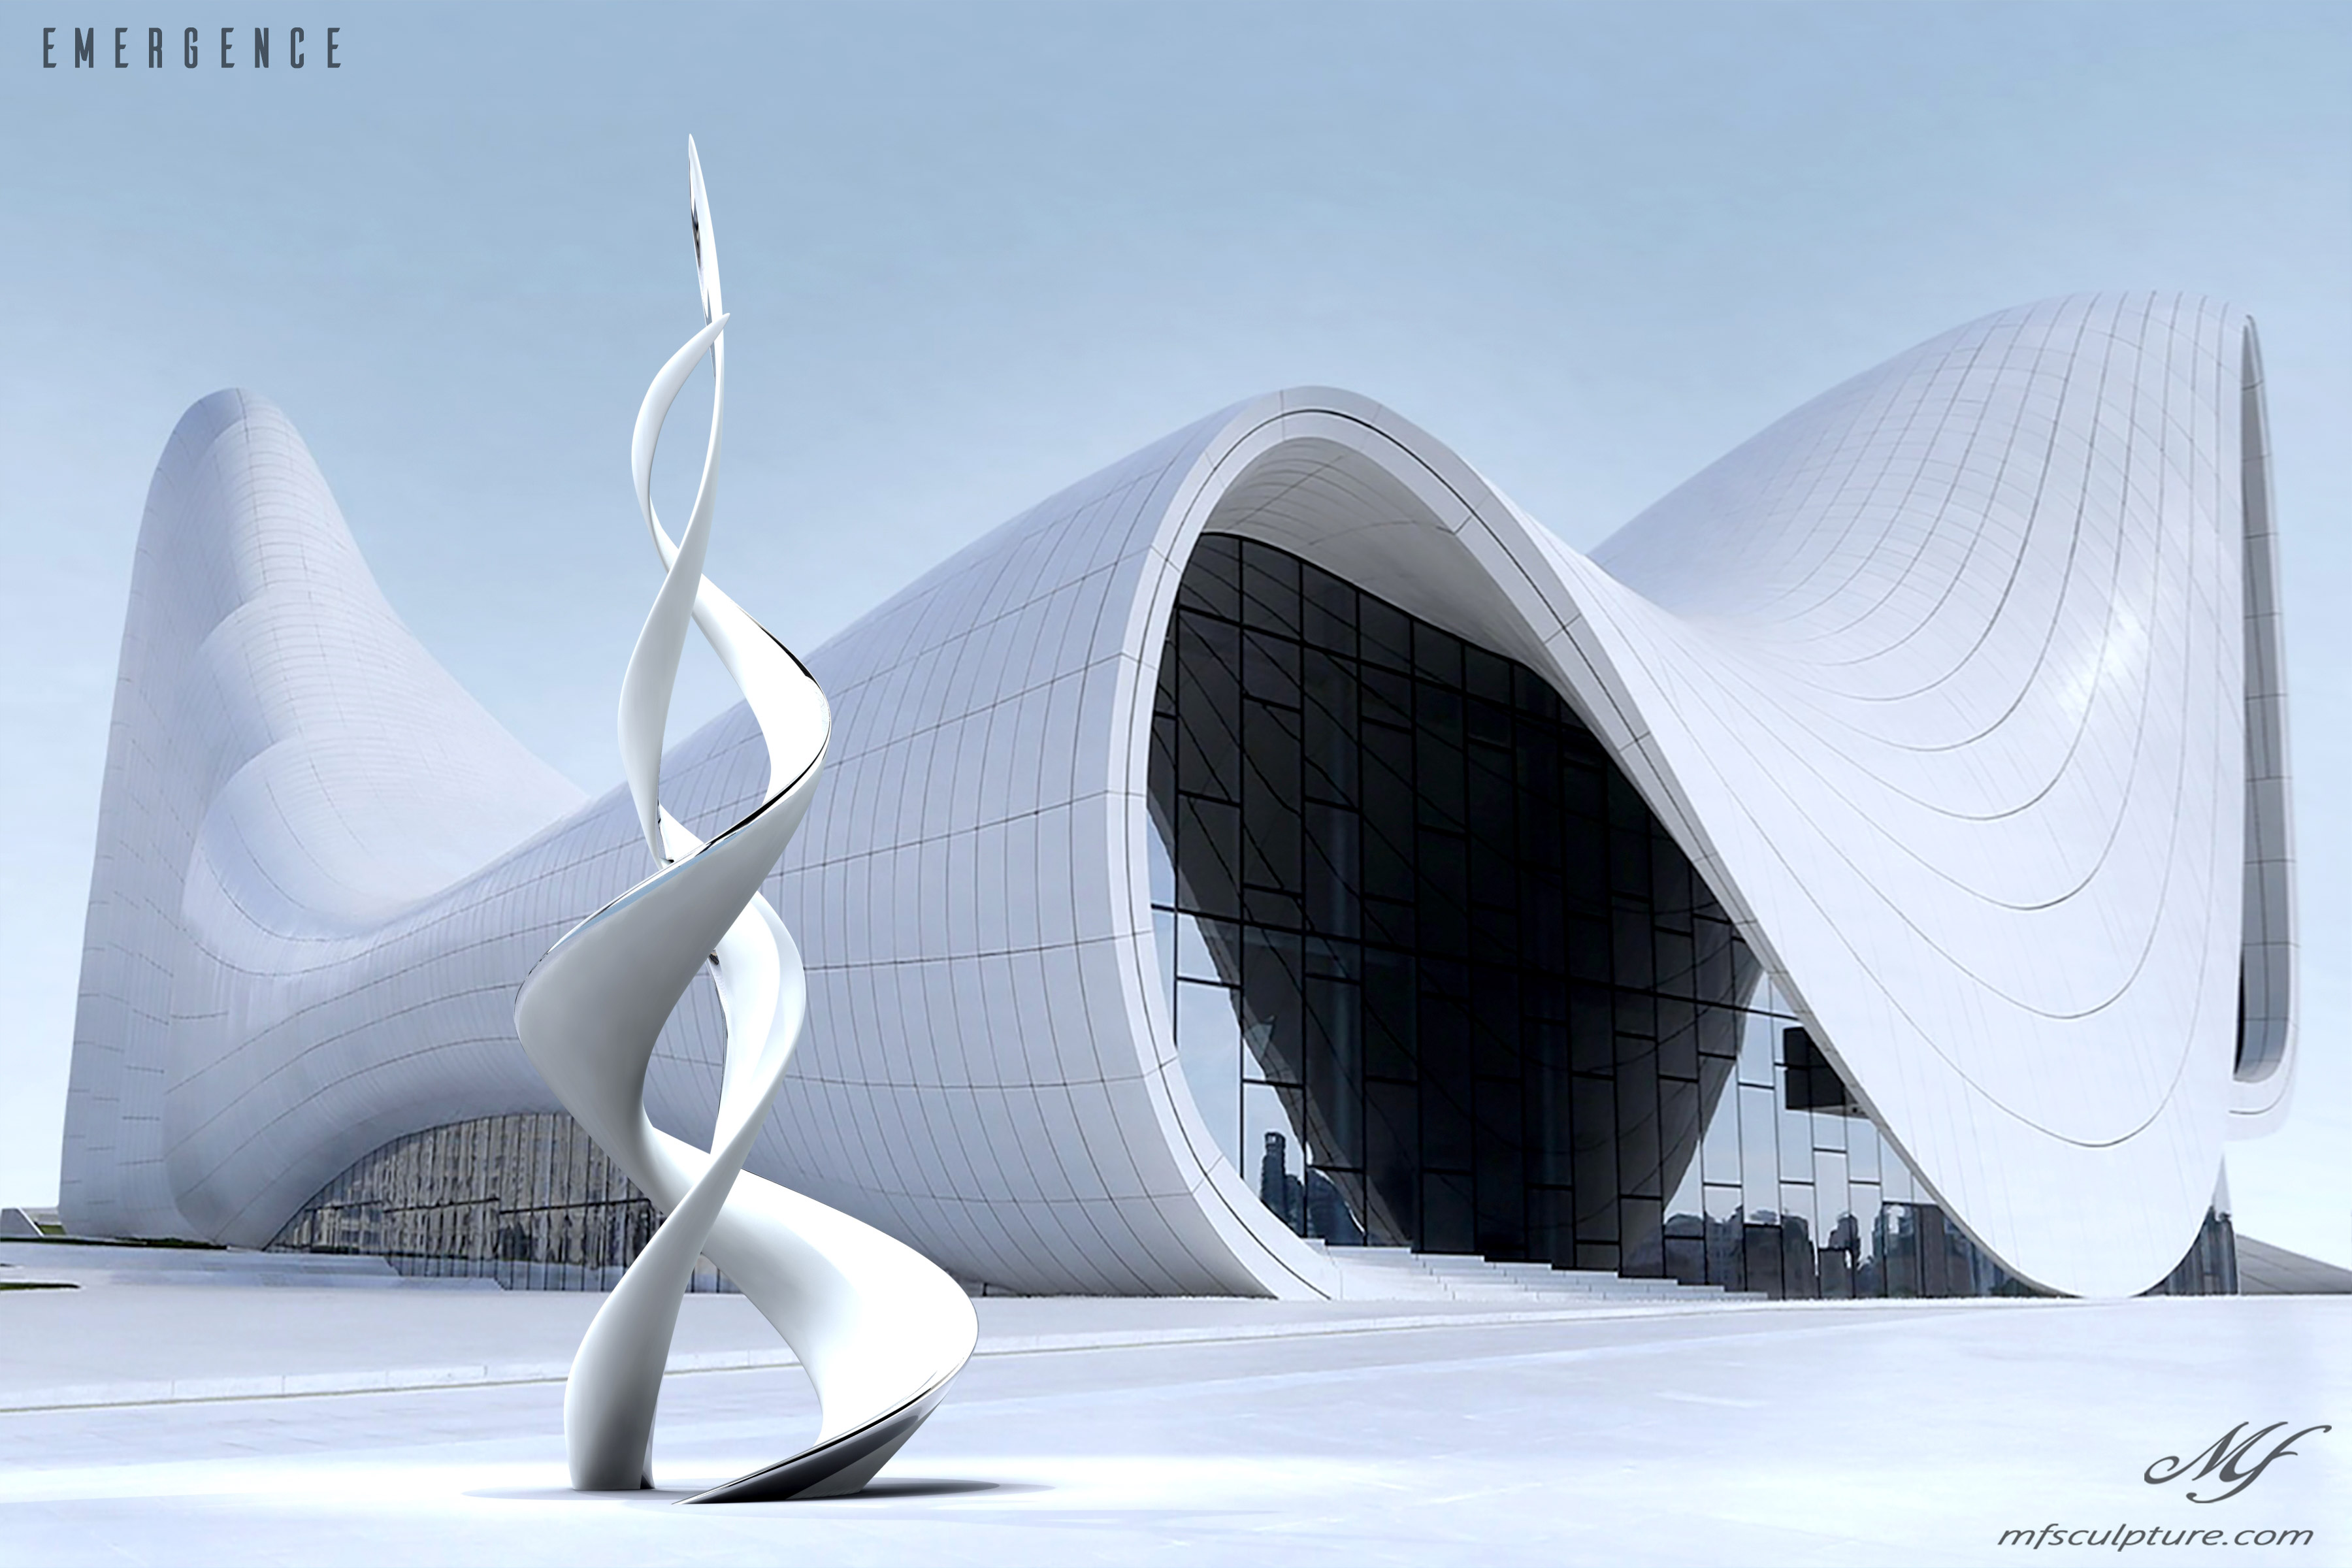 Heydar aliyev center baku zaha hadid Unity Modern Sculpture Emergence Monument 5